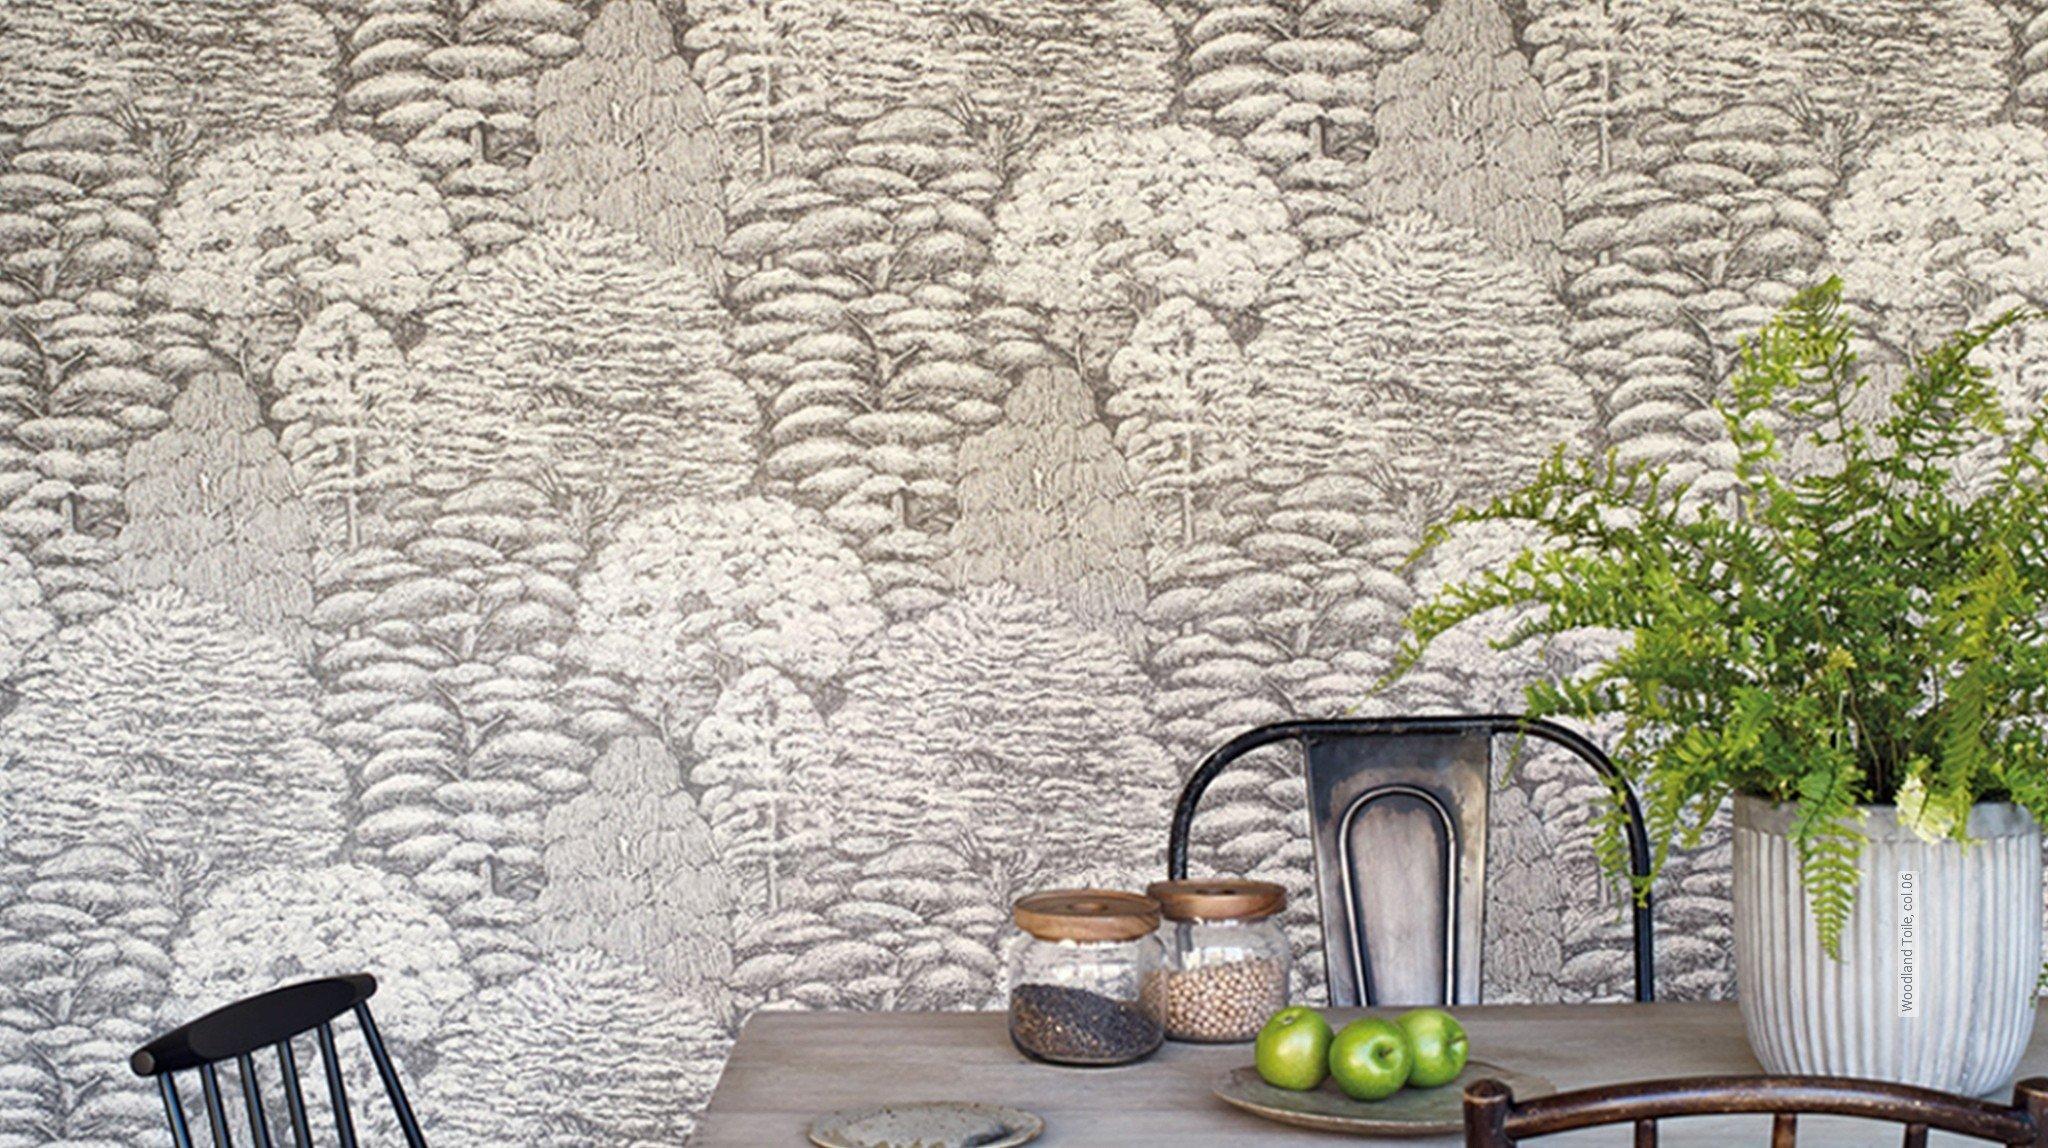 florale muster toile de jouy tapeten lust auf was neues. Black Bedroom Furniture Sets. Home Design Ideas